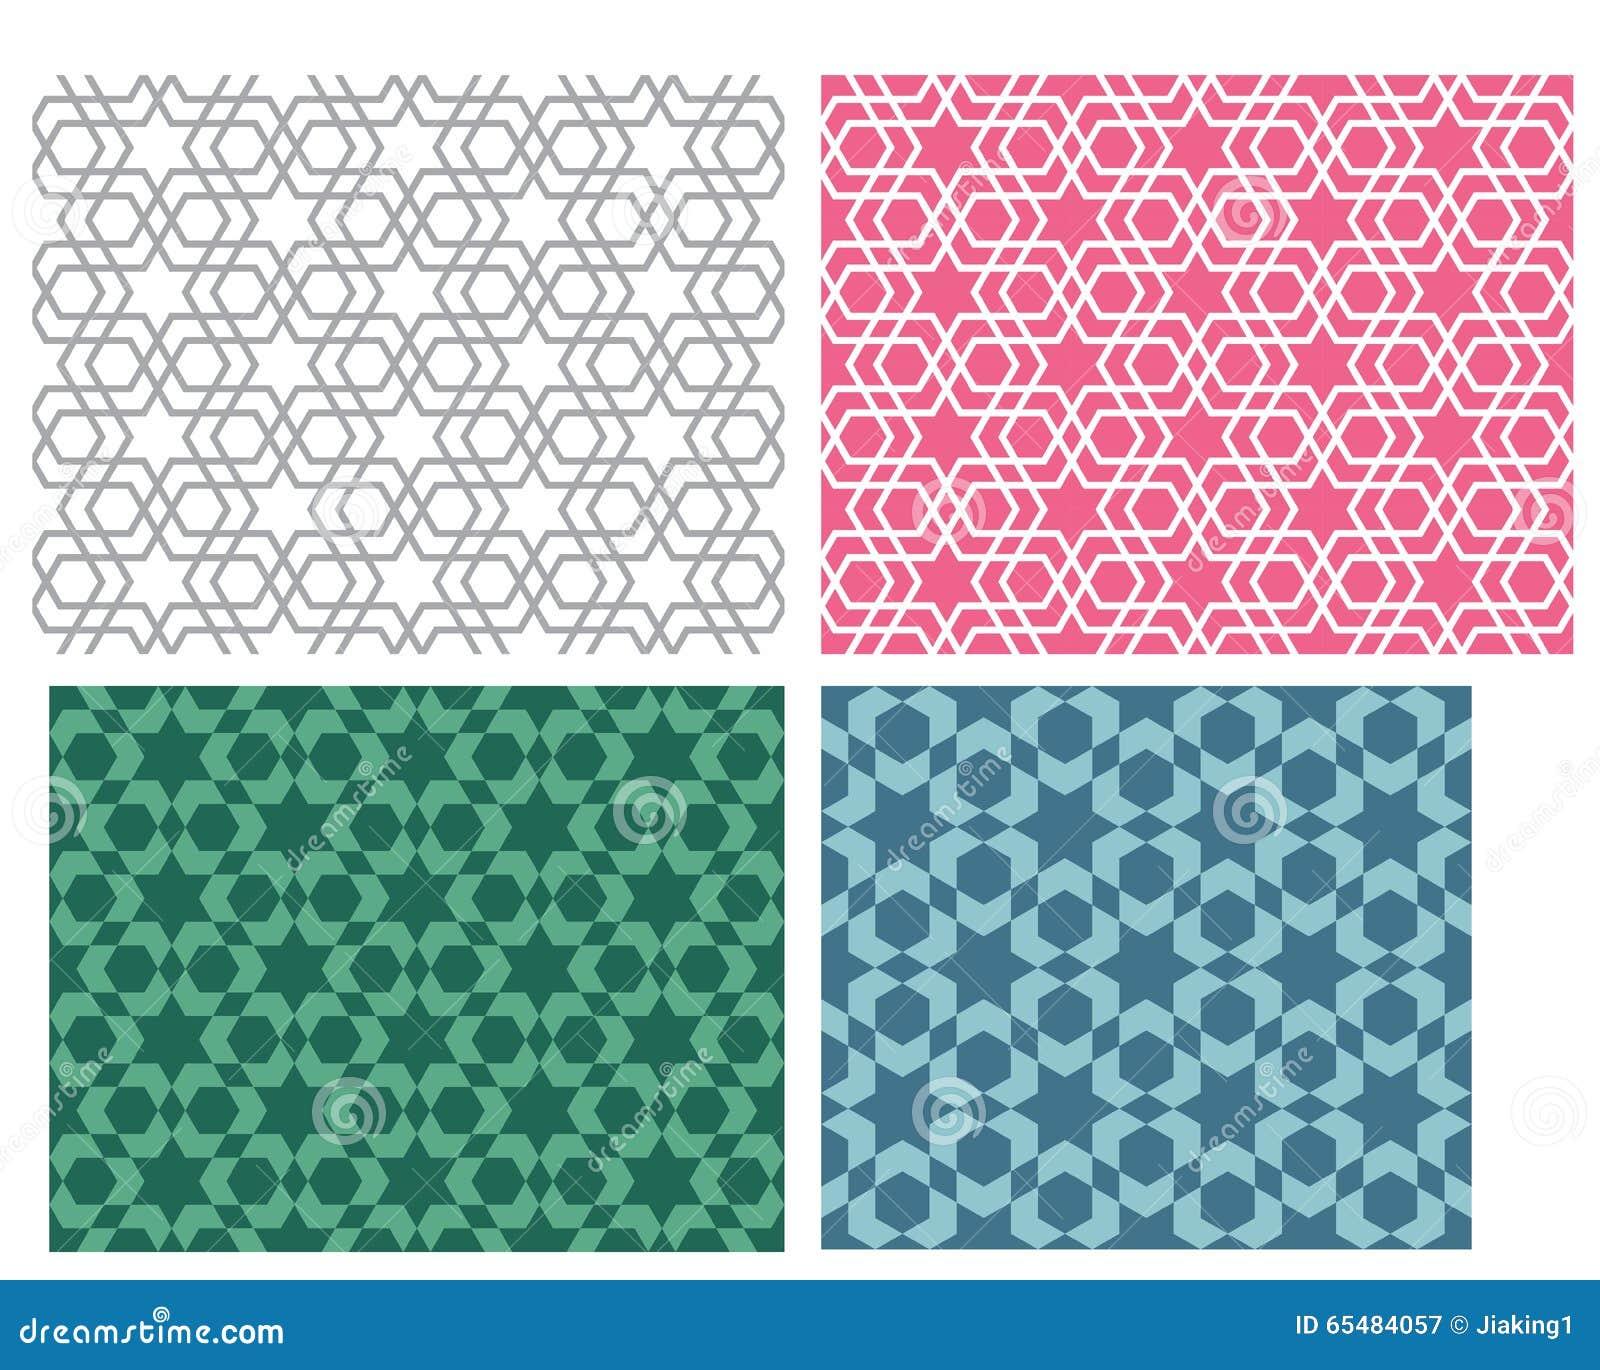 Hexagon Korean Stock Illustrations – 4 Hexagon Korean Stock